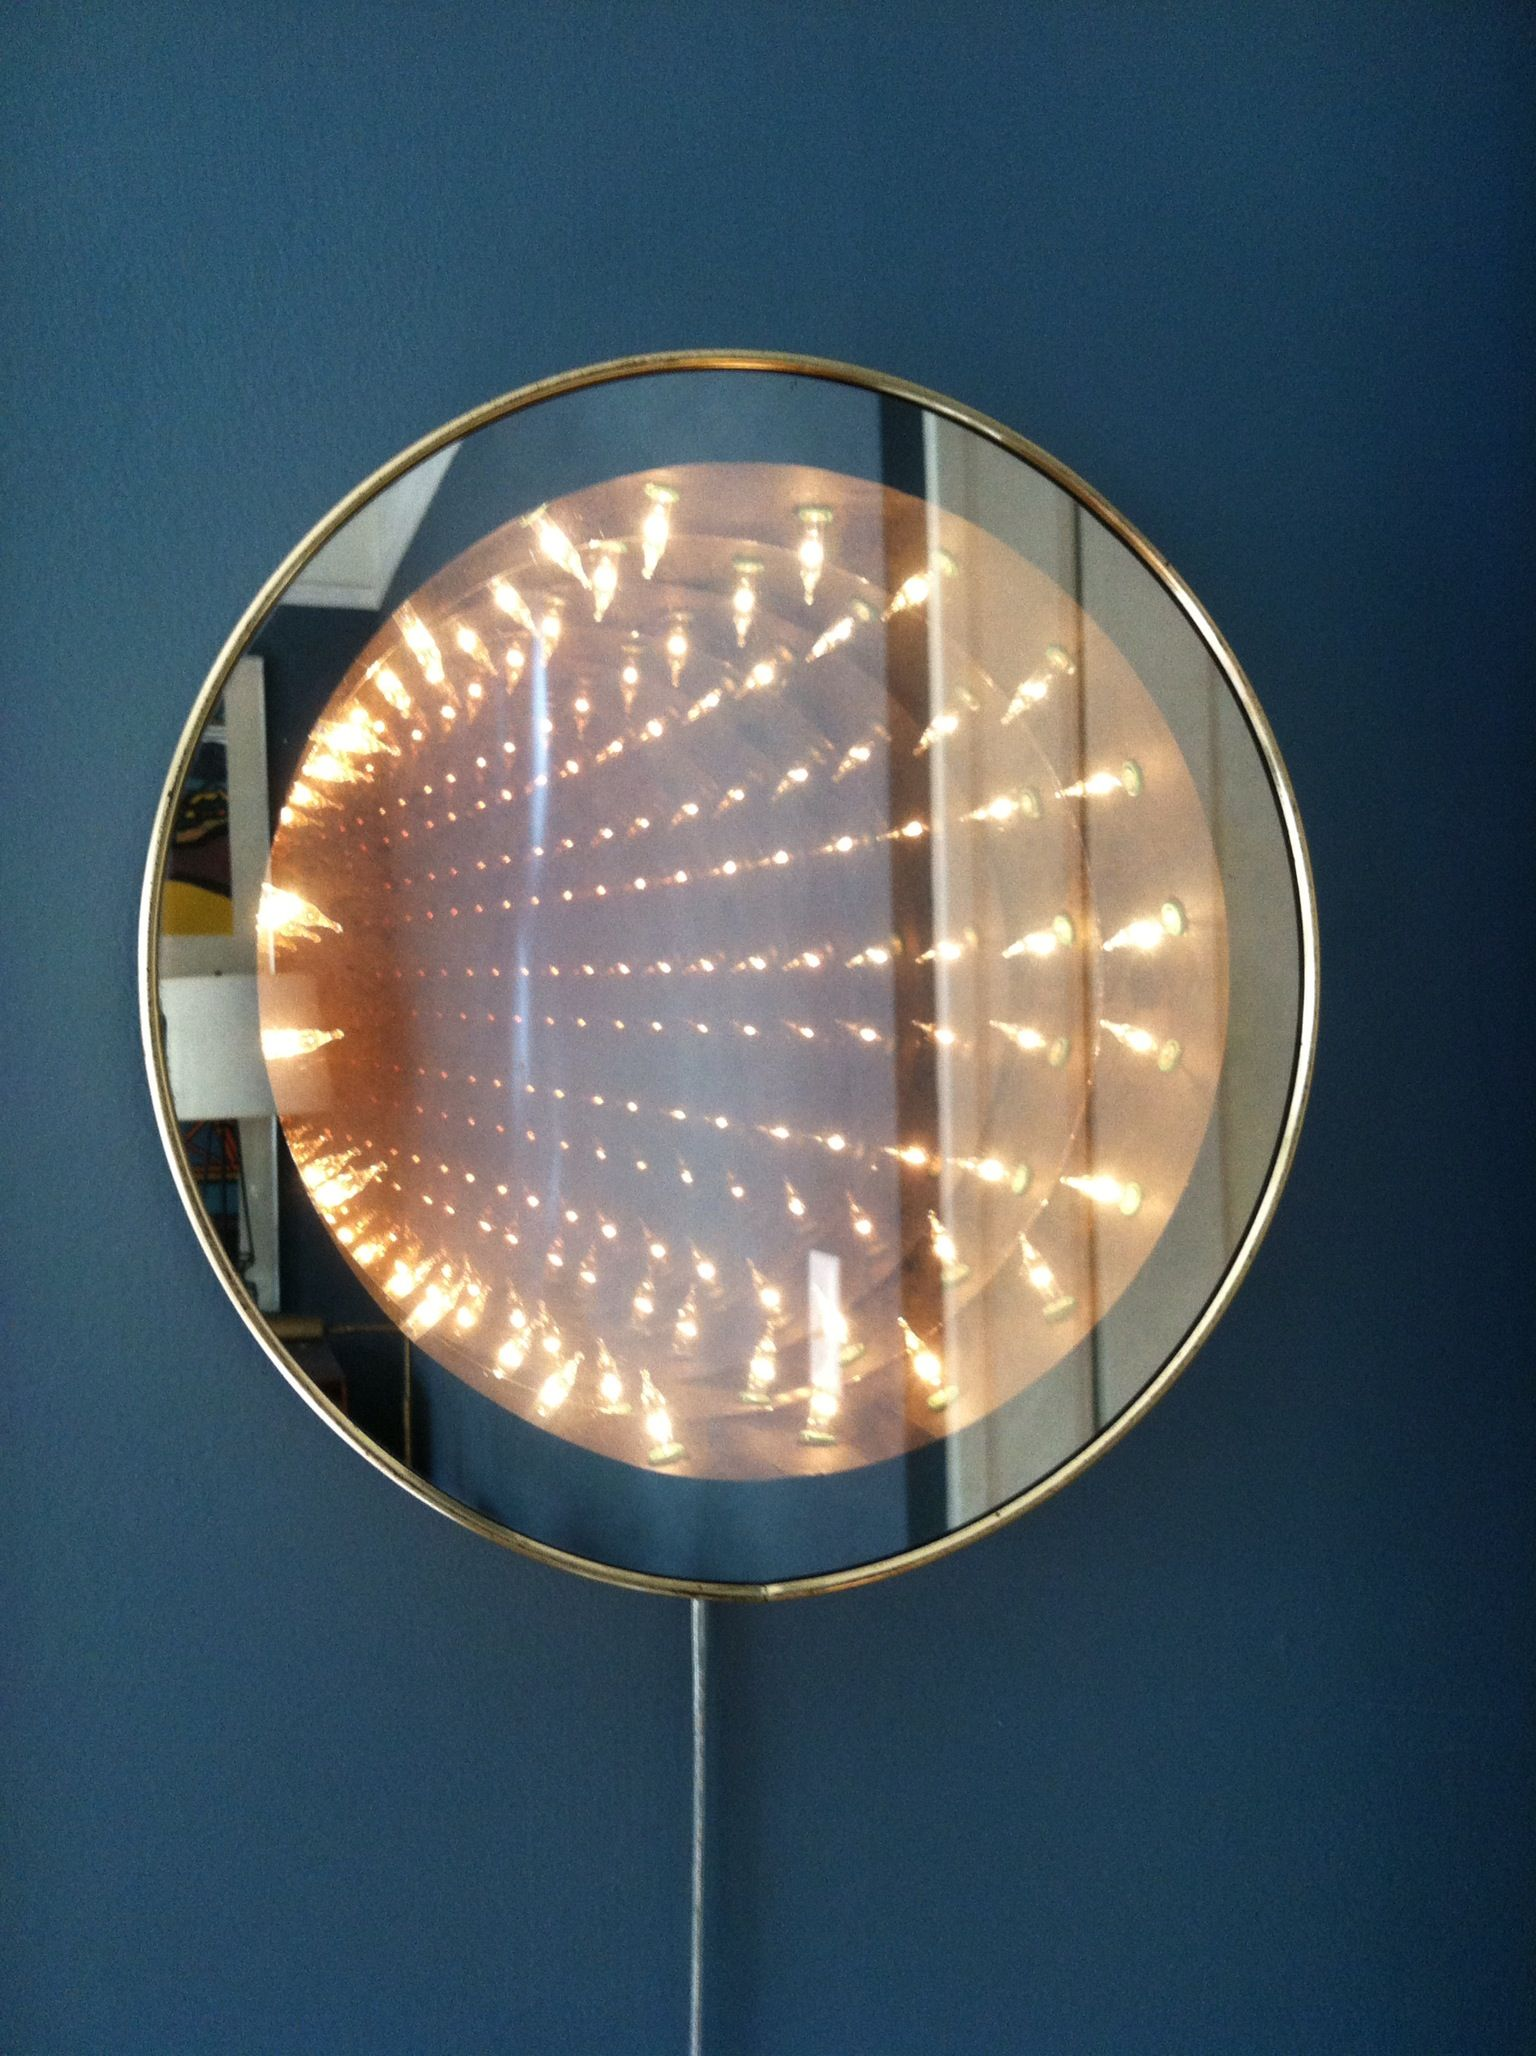 Infinity Mirror Licht Kolonialstil Beleuchtung